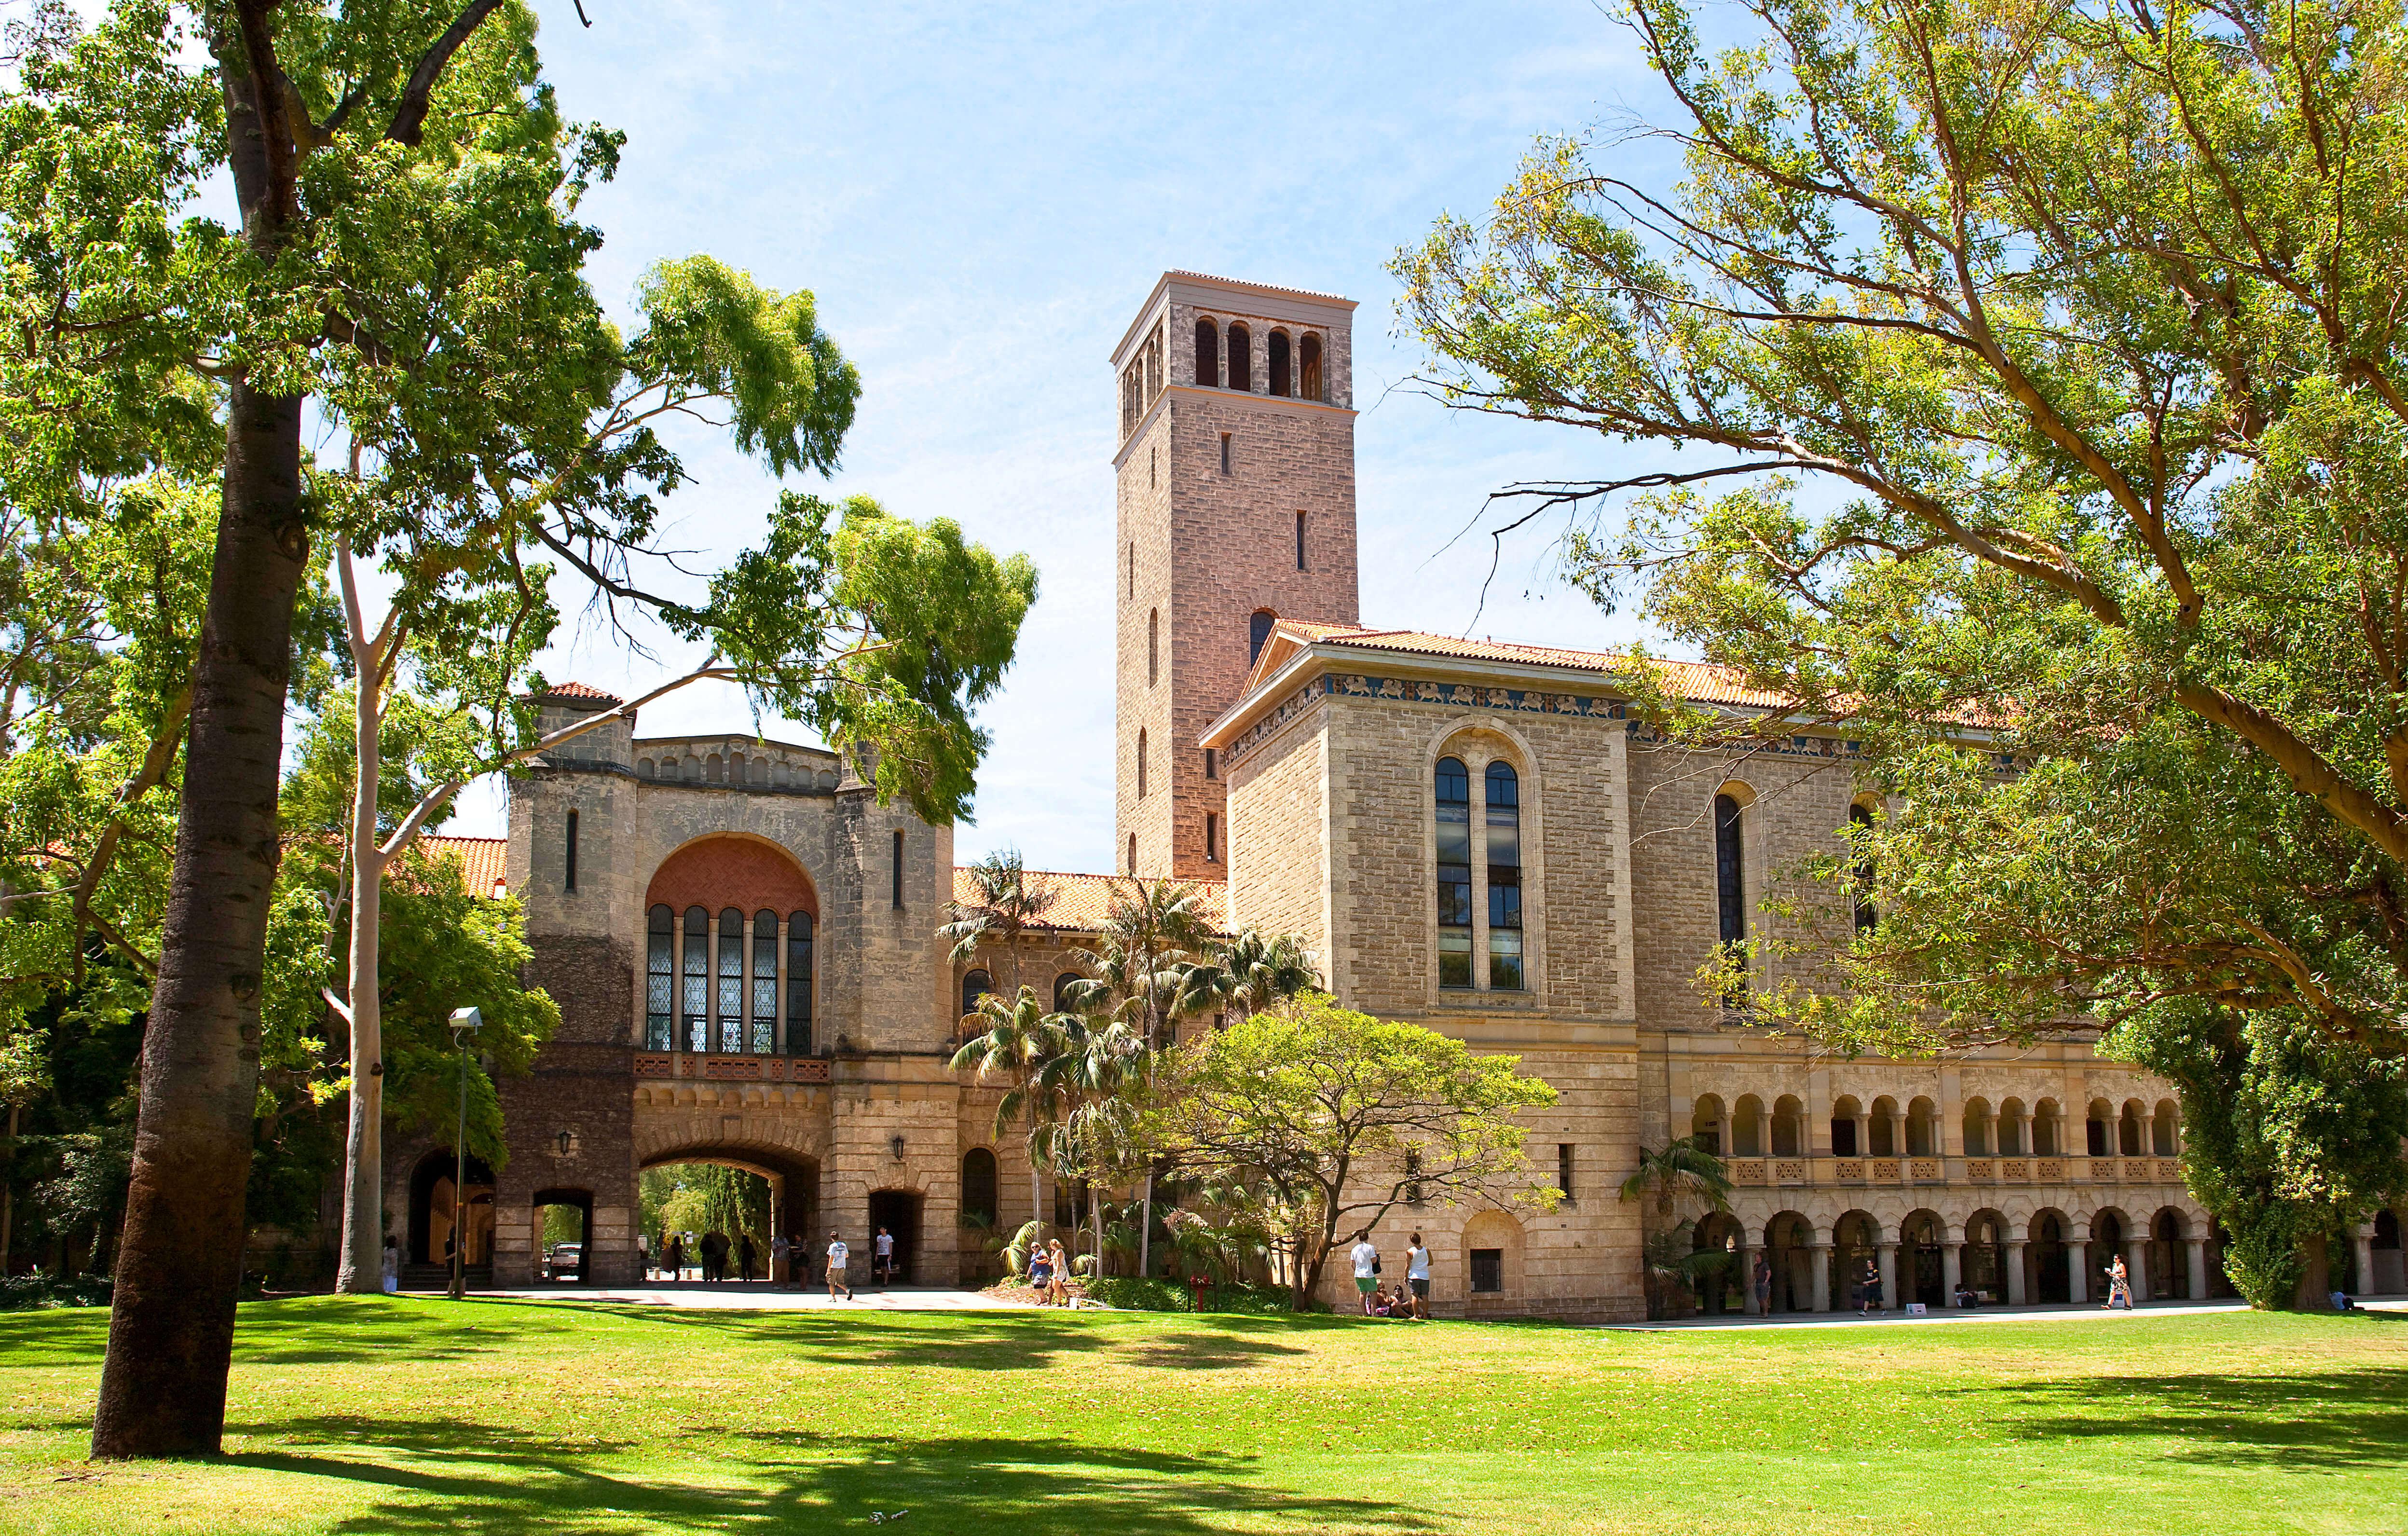 The University of Western Australia: Where employable graduates are made